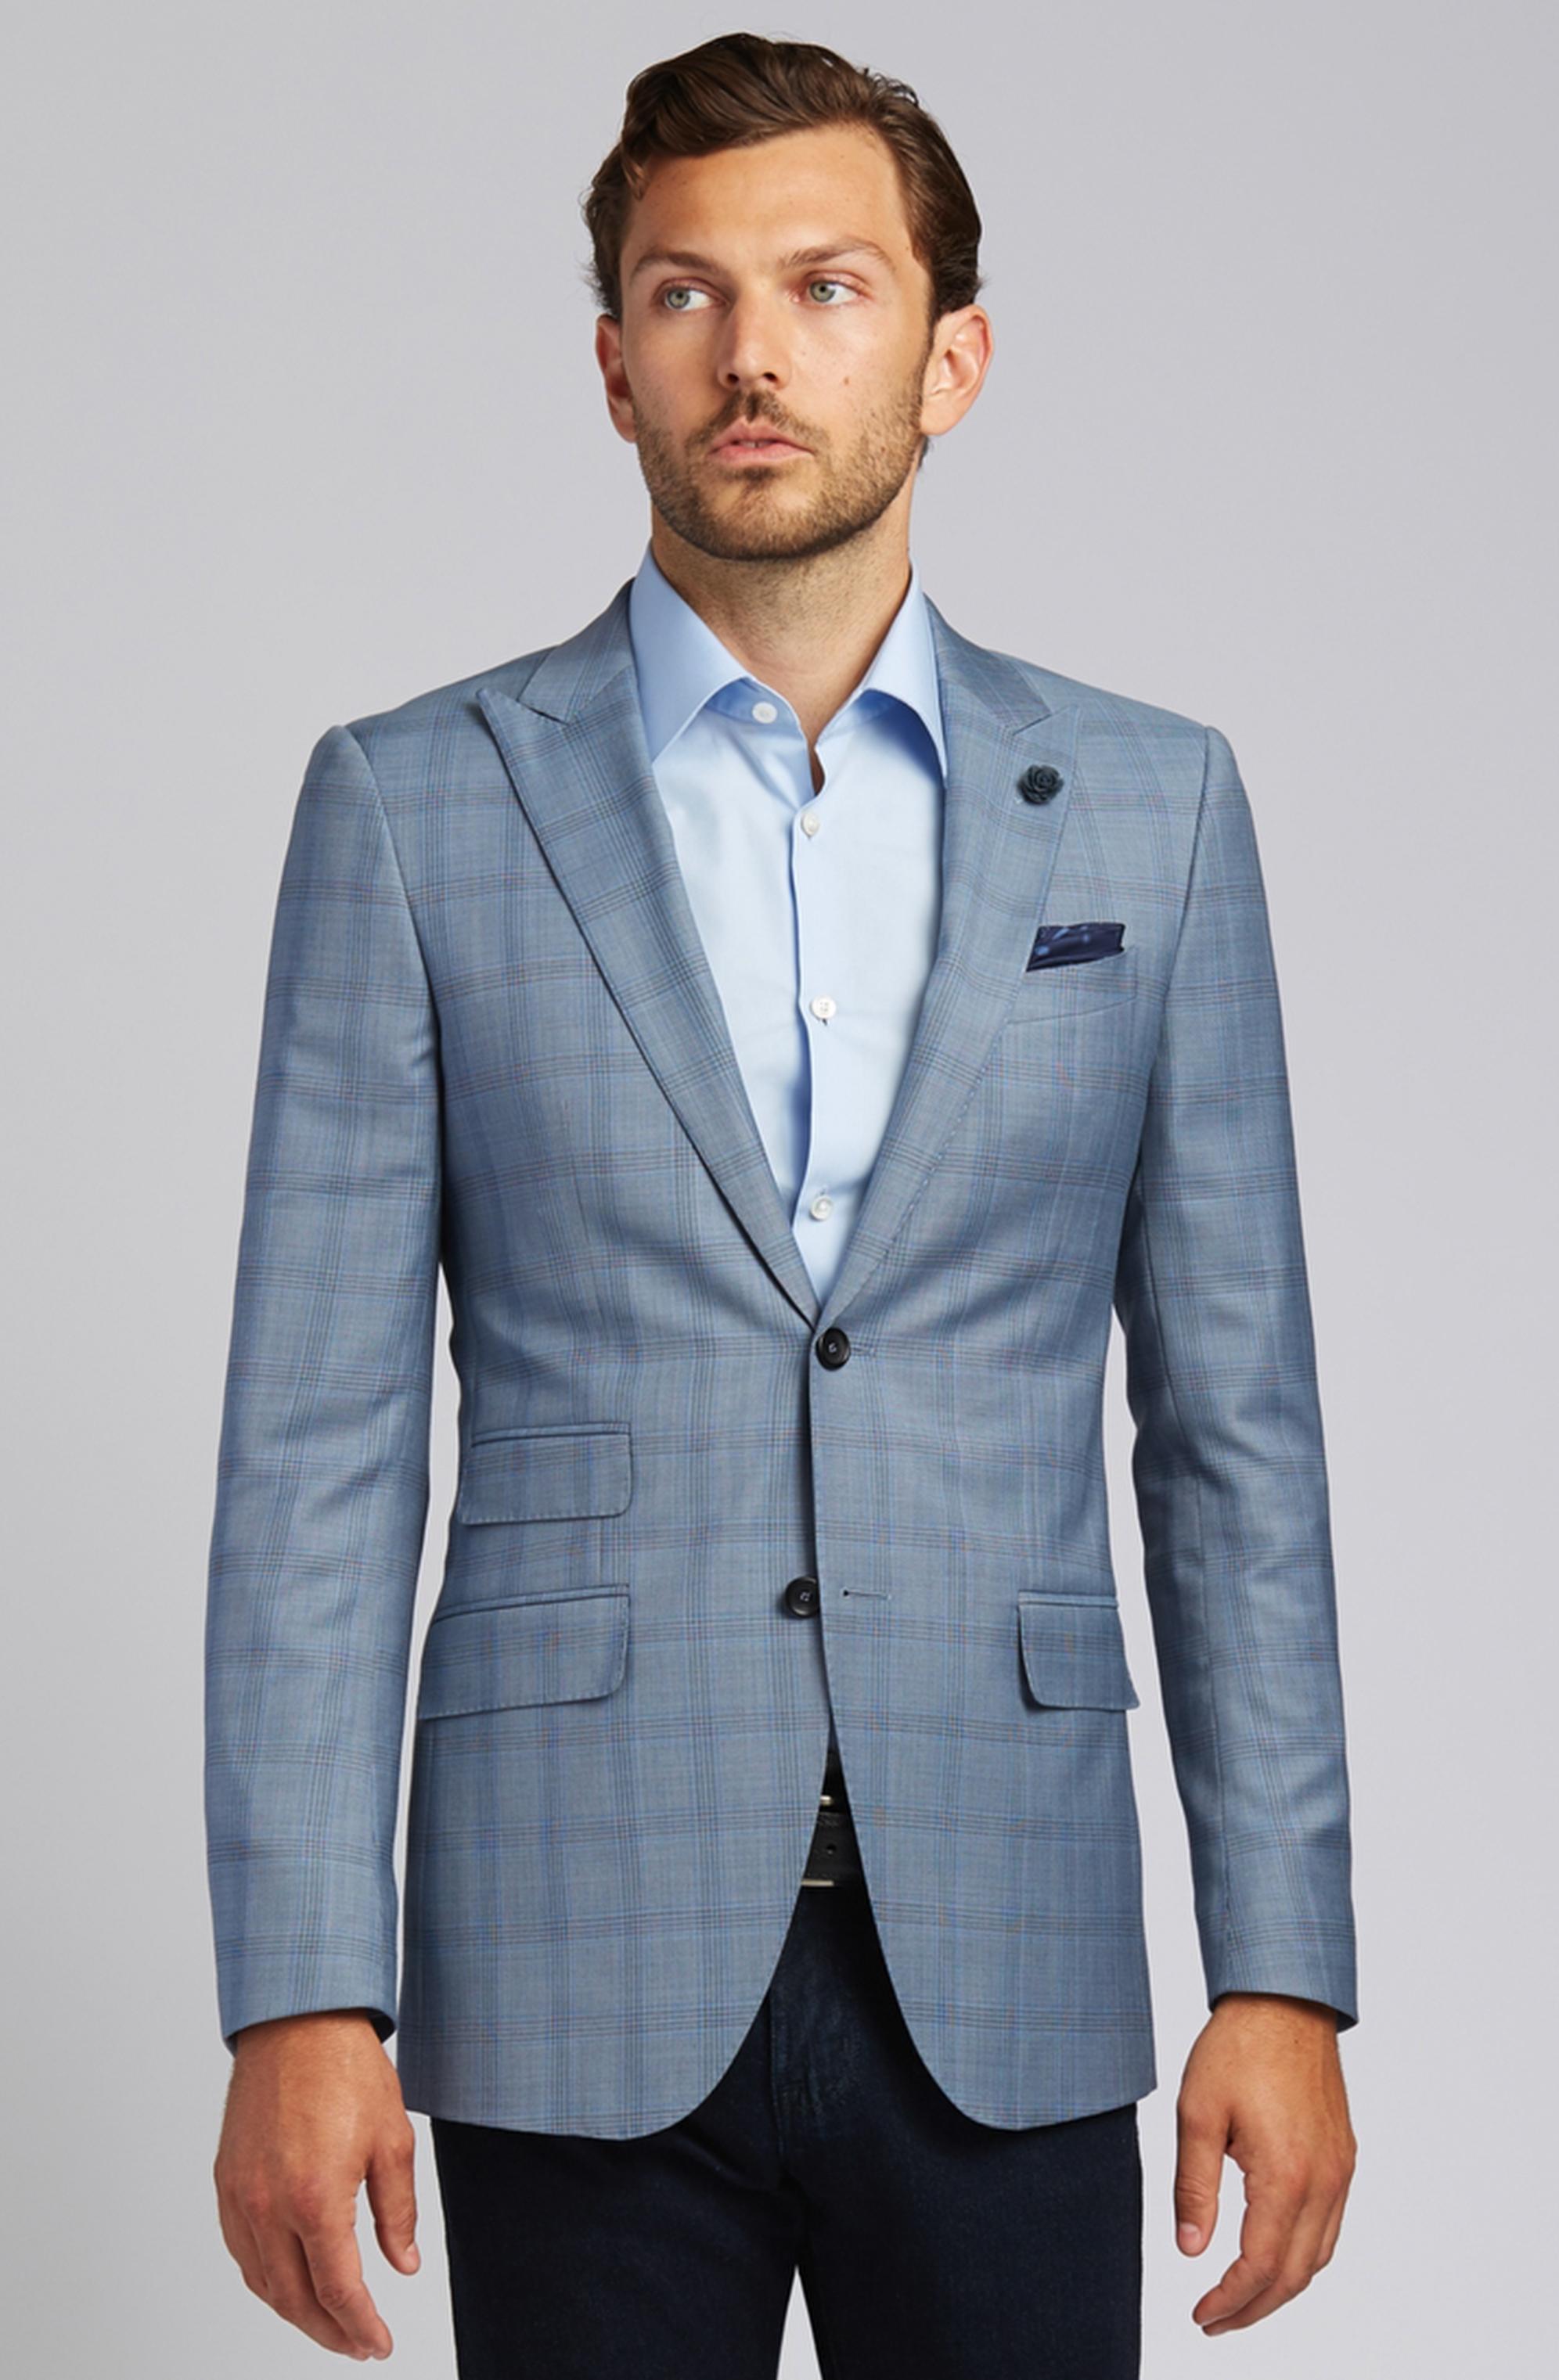 Slim-Fit Super 130s Wool Jacket in Steel Blue Glen Plaid